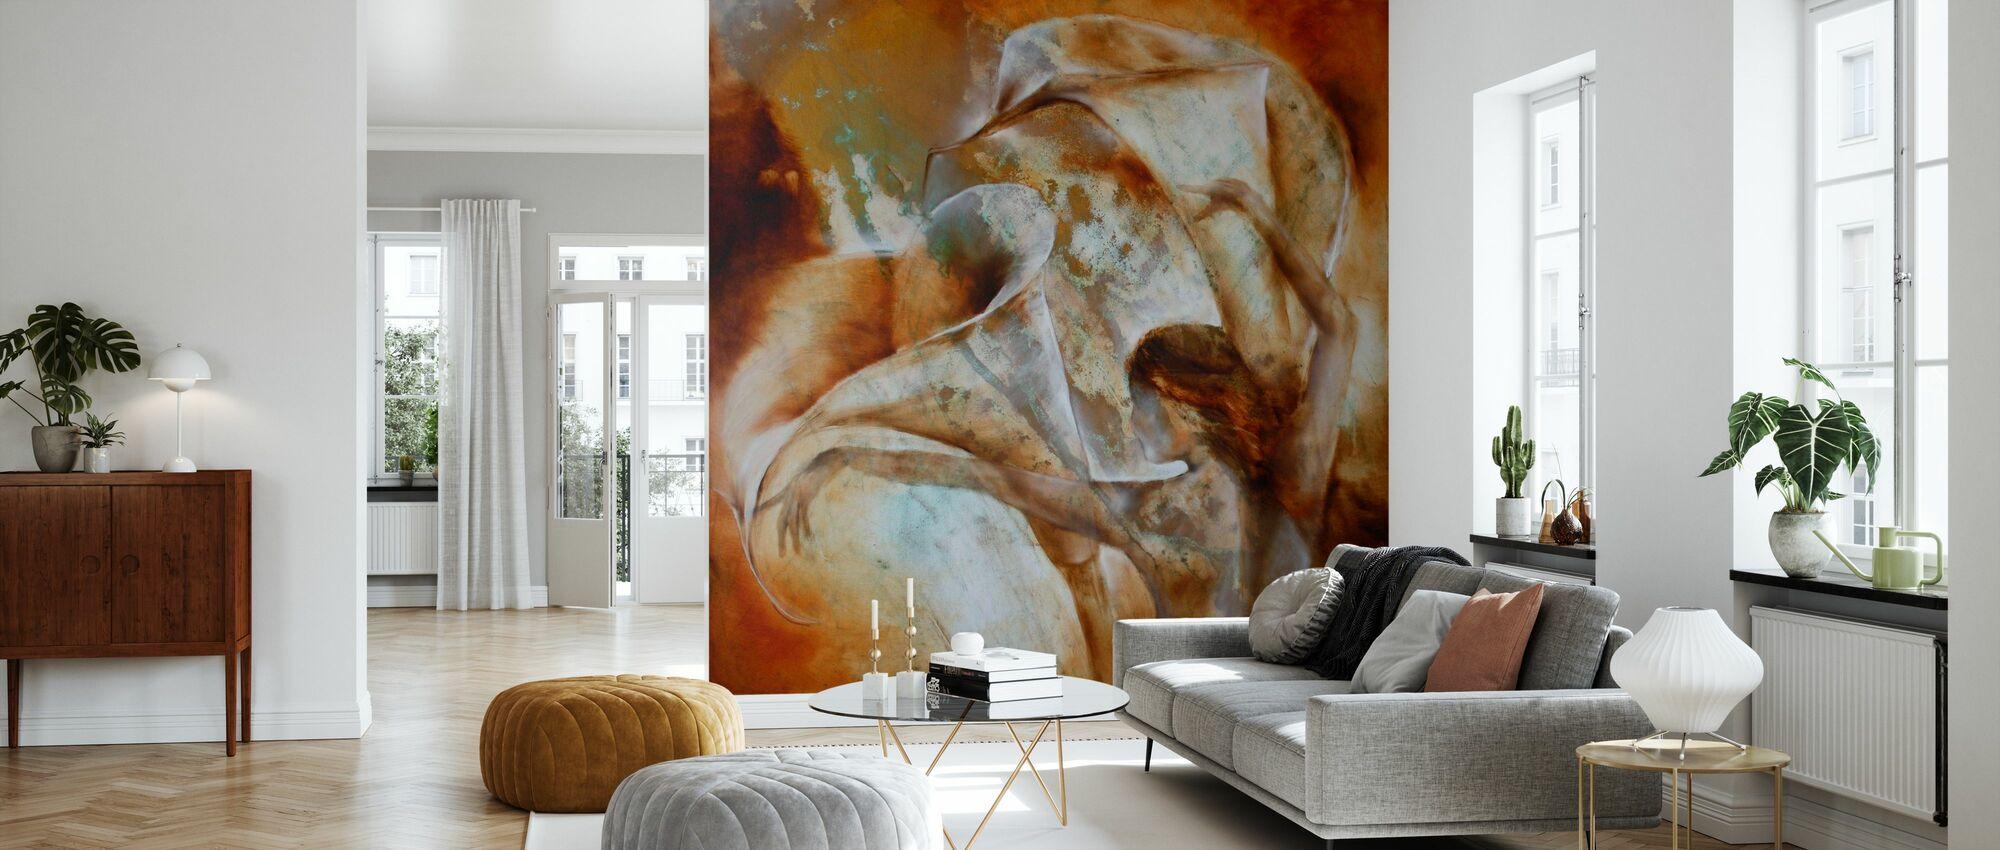 Allegro - Wallpaper - Living Room